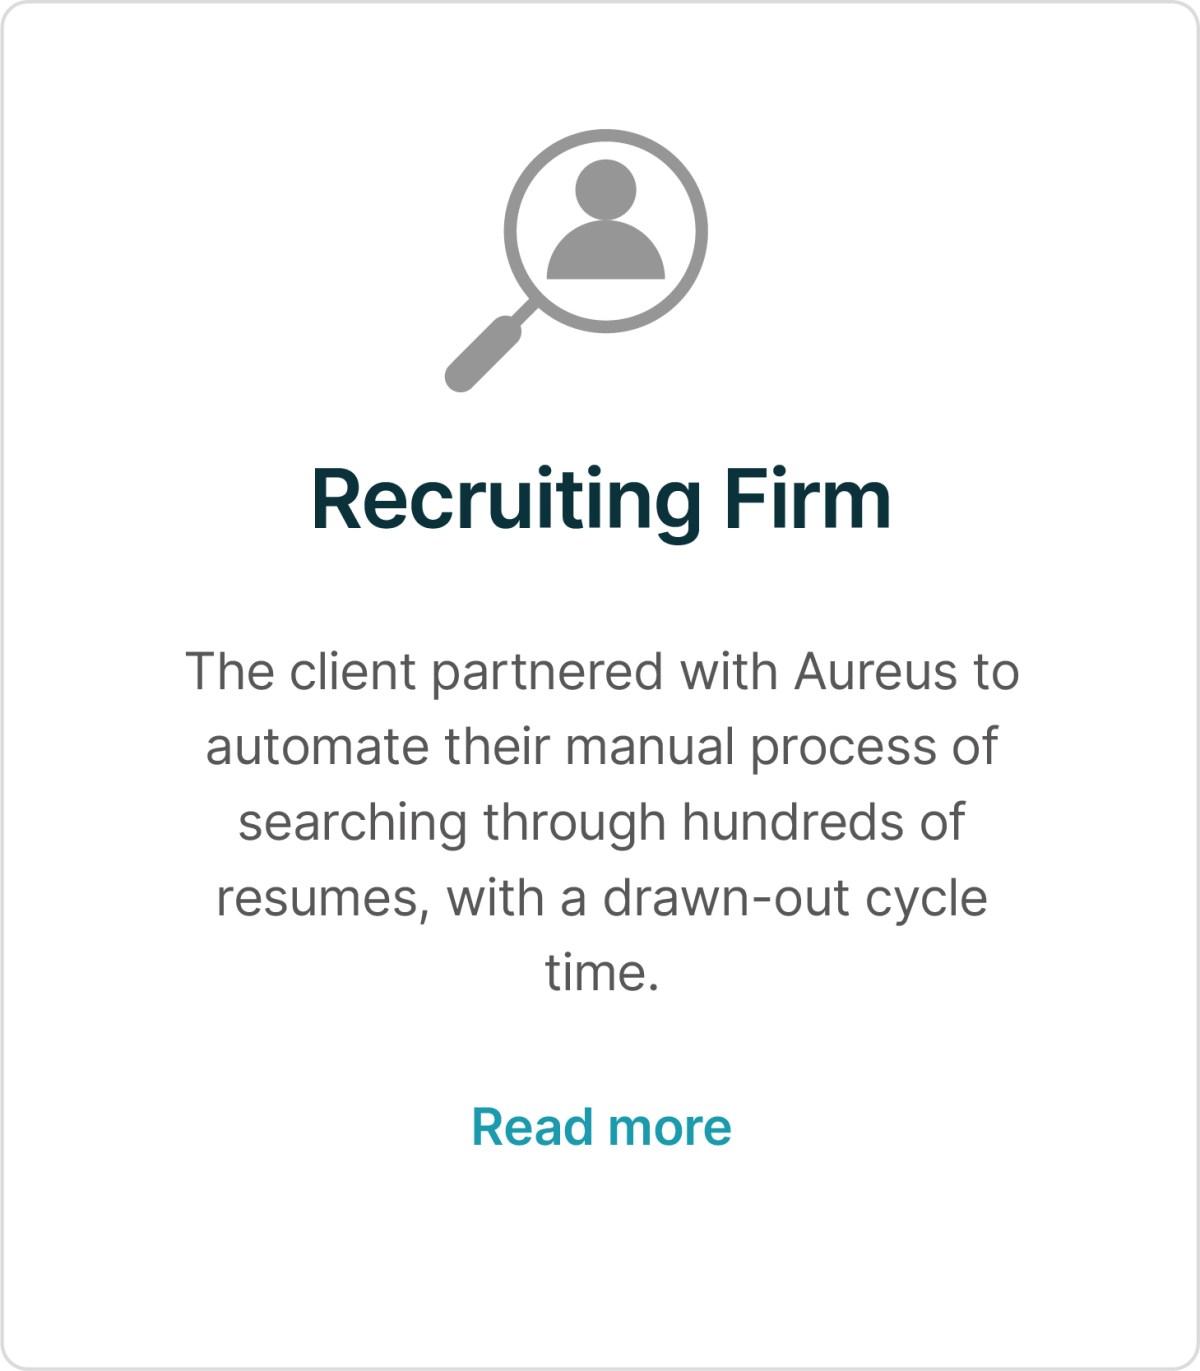 Recruiting Firm